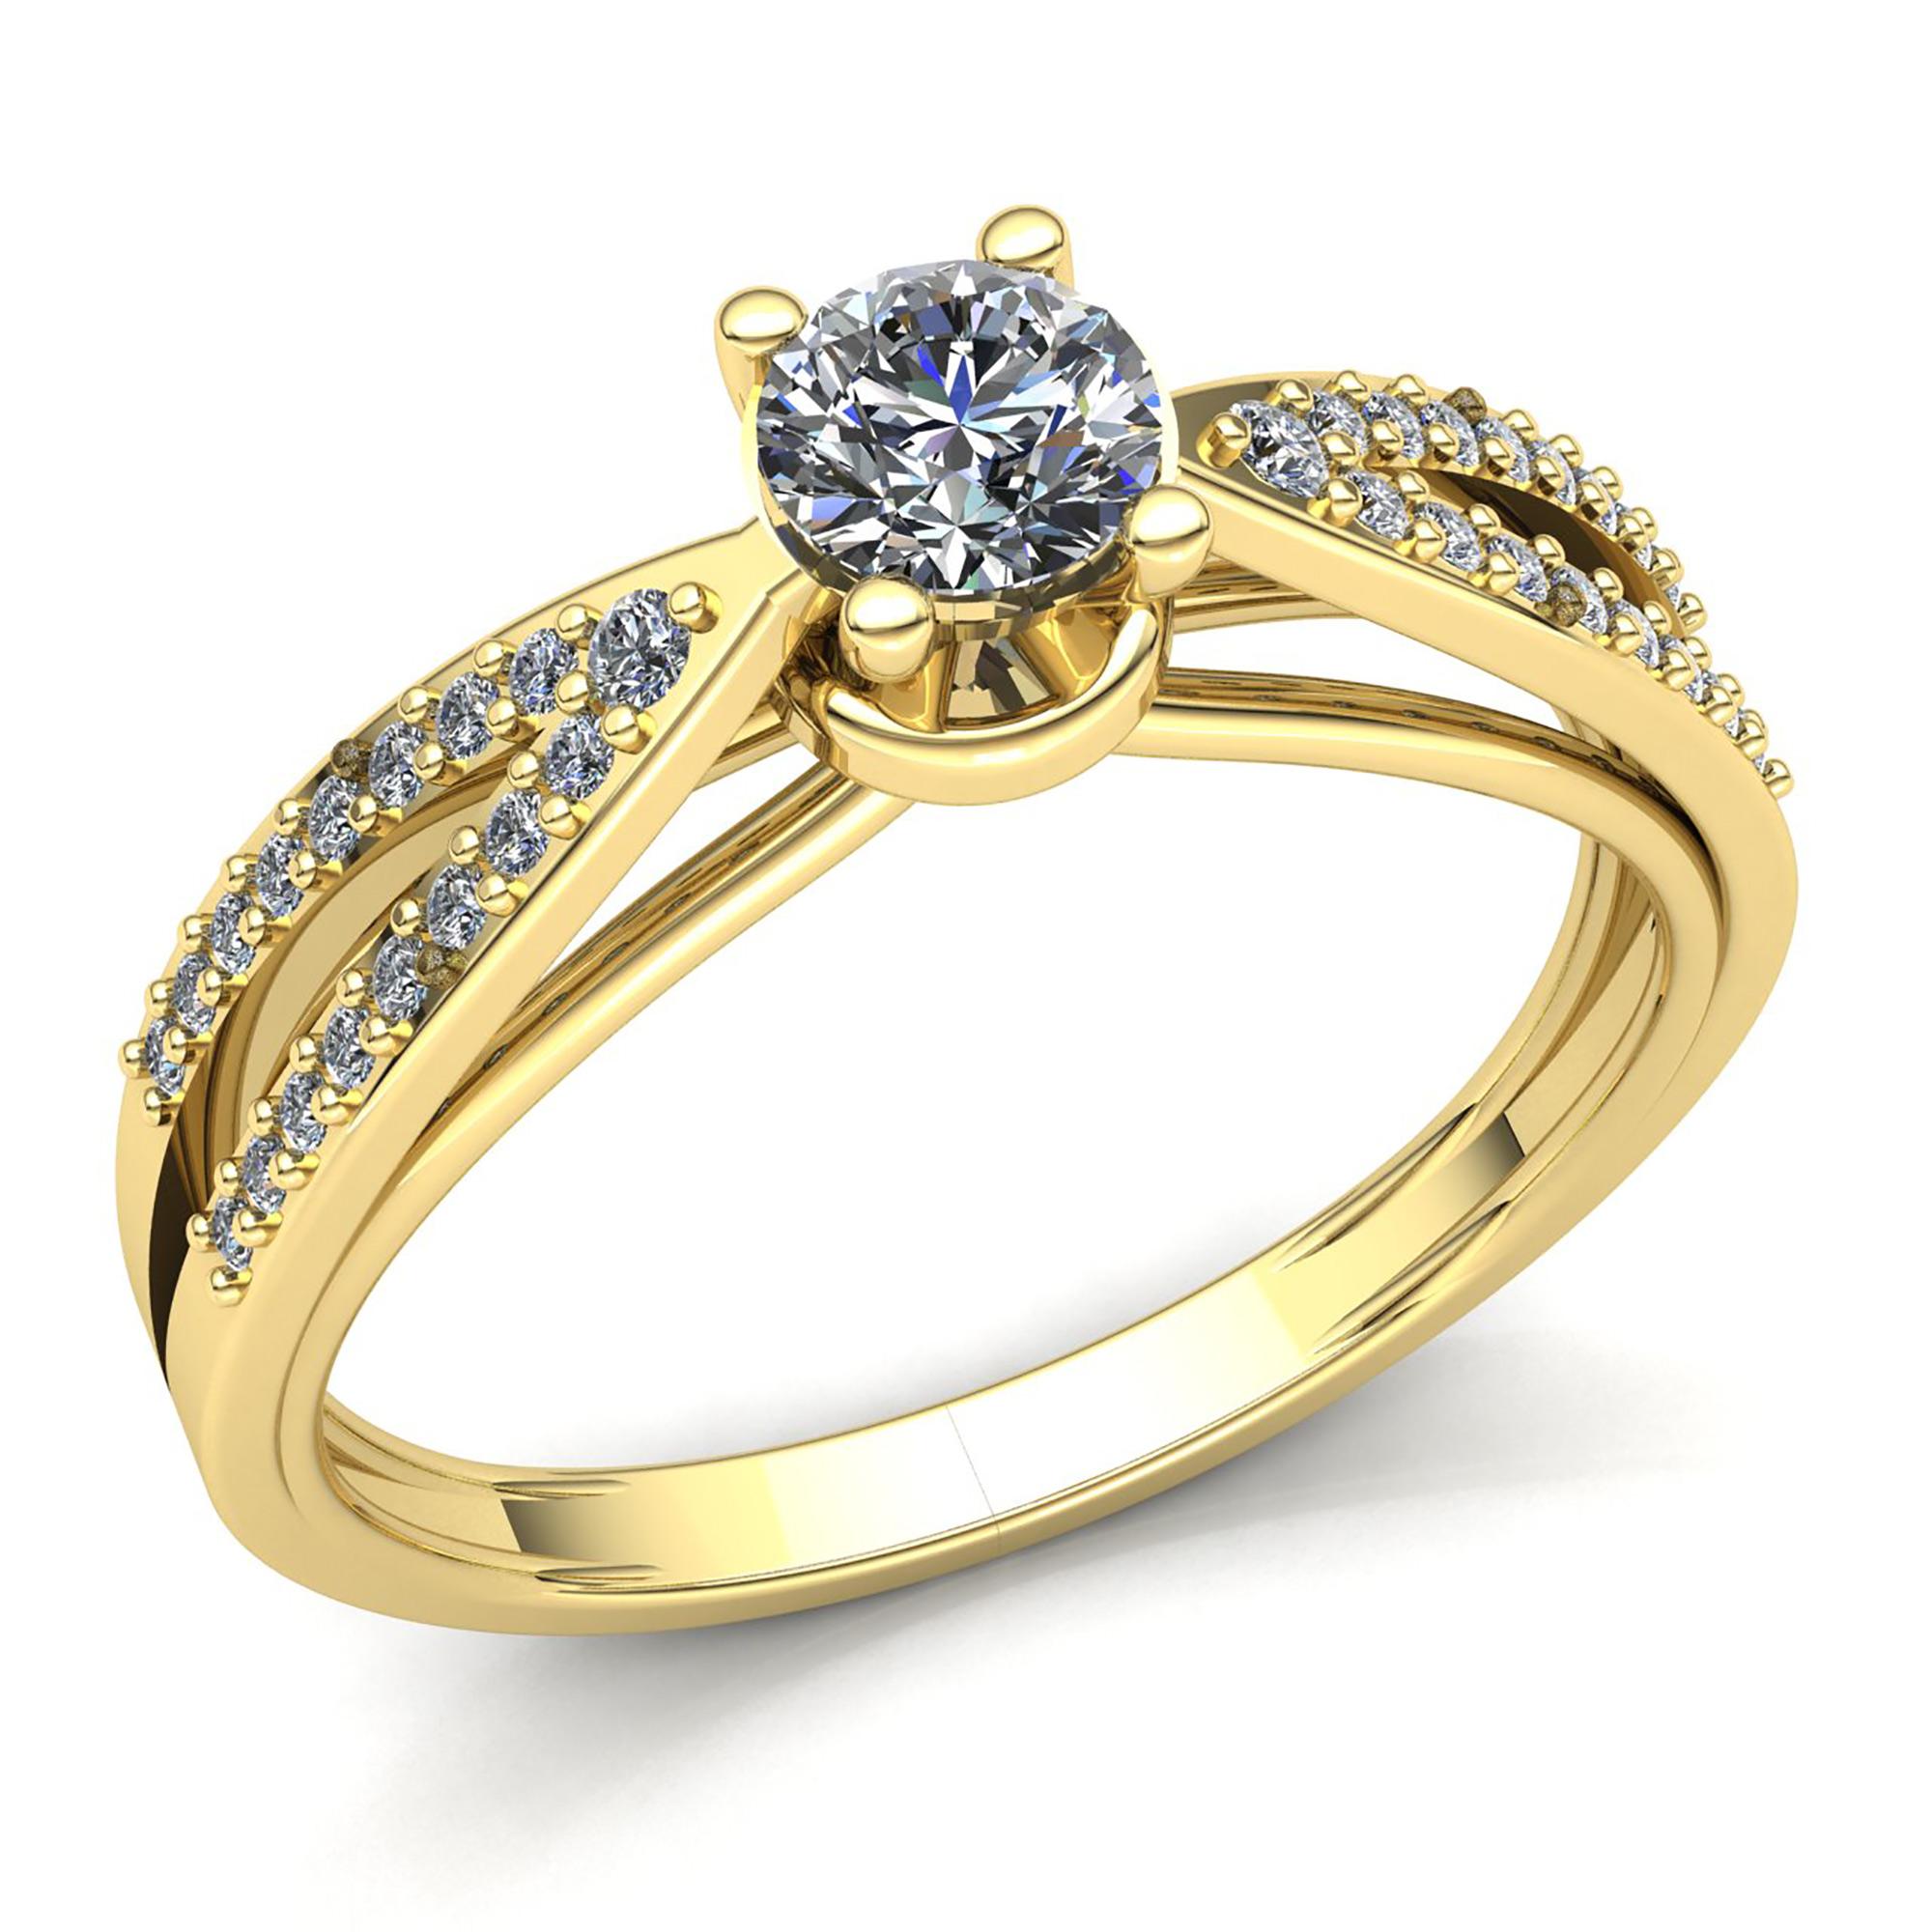 clarity enhanced diamond price guide